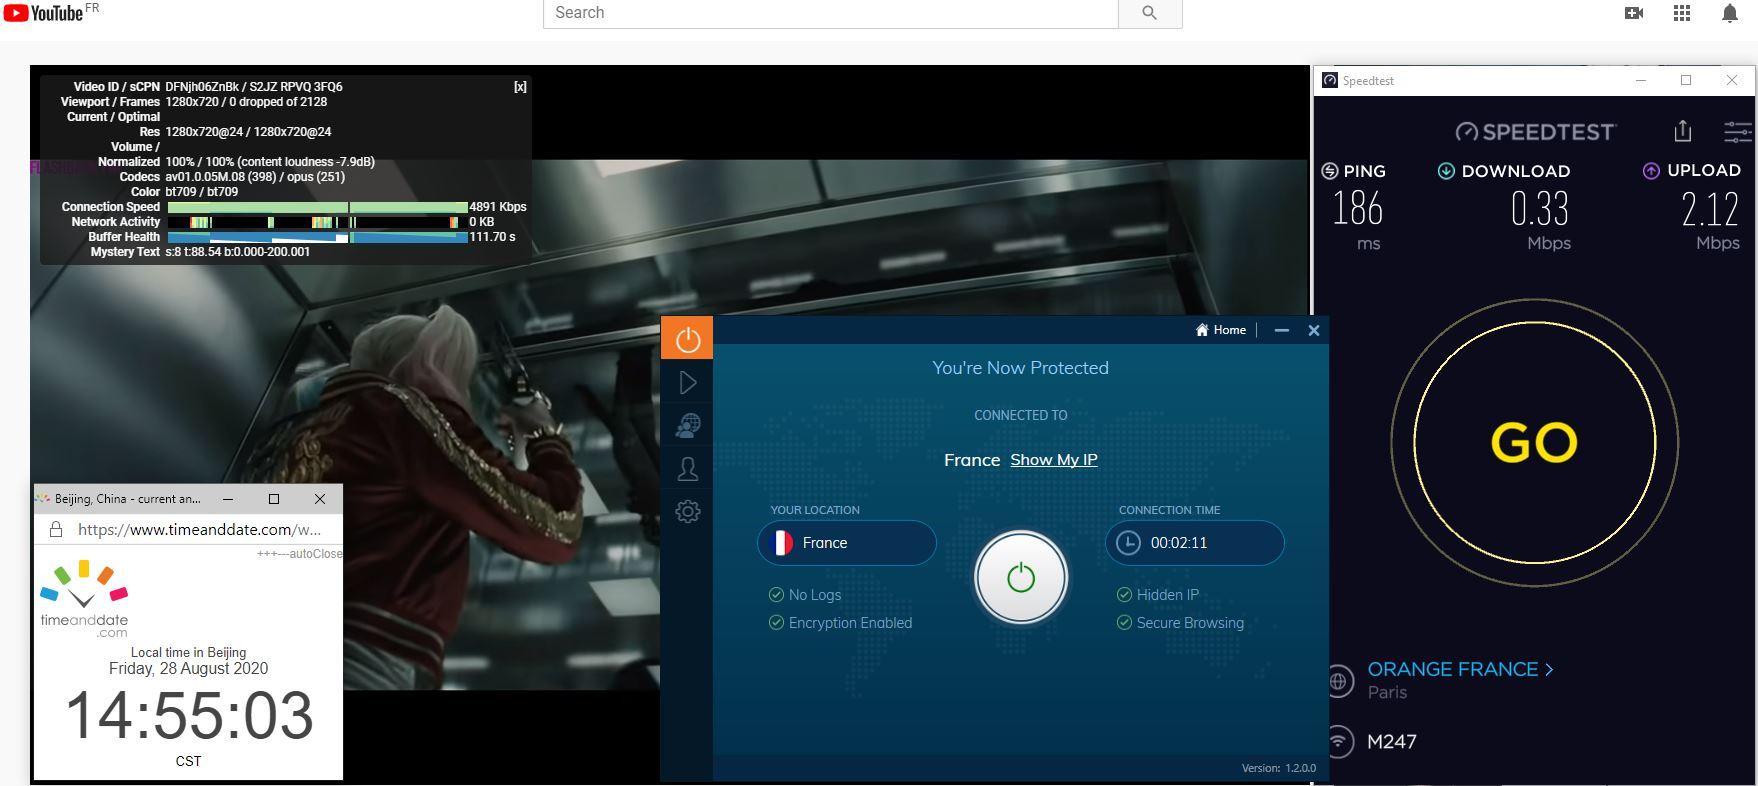 Windows10 IvacyVPN UDP+Port 5555 France 中国VPN 翻墙 科学上网 翻墙速度测试 - 20200828